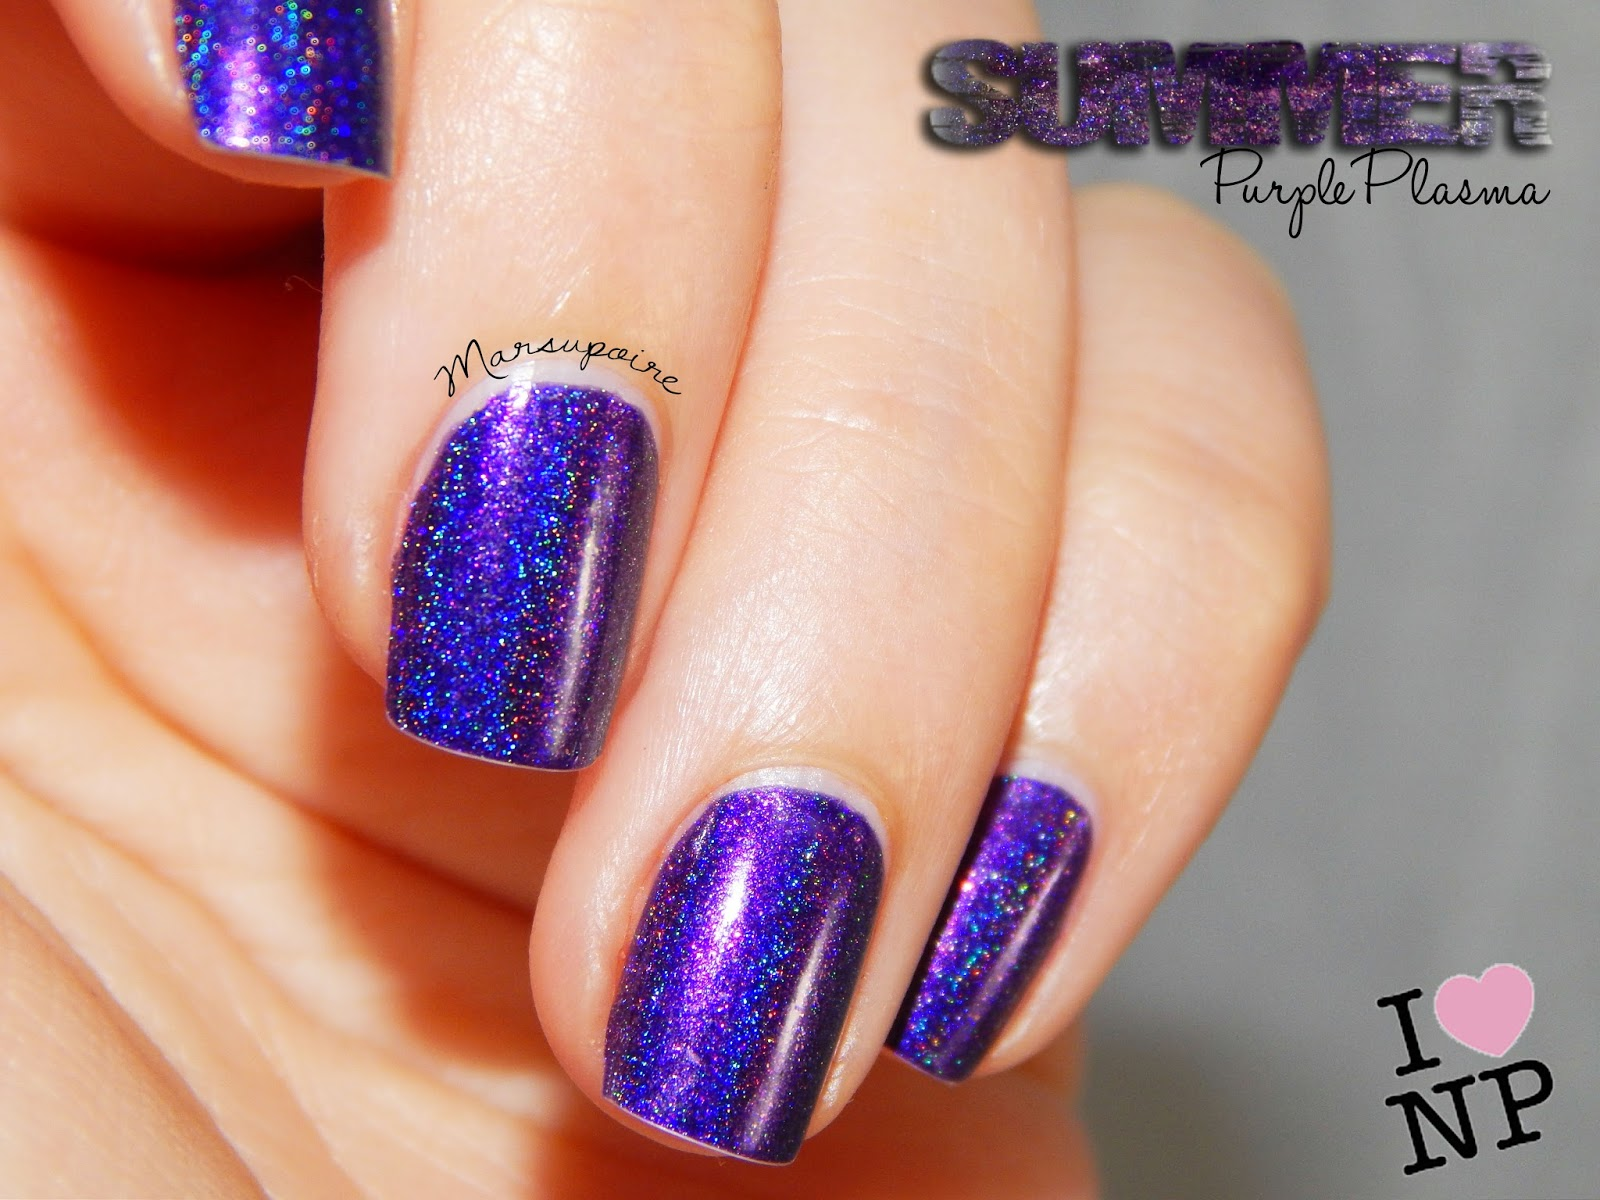 Vernis_ILNP_purple plasma_flash